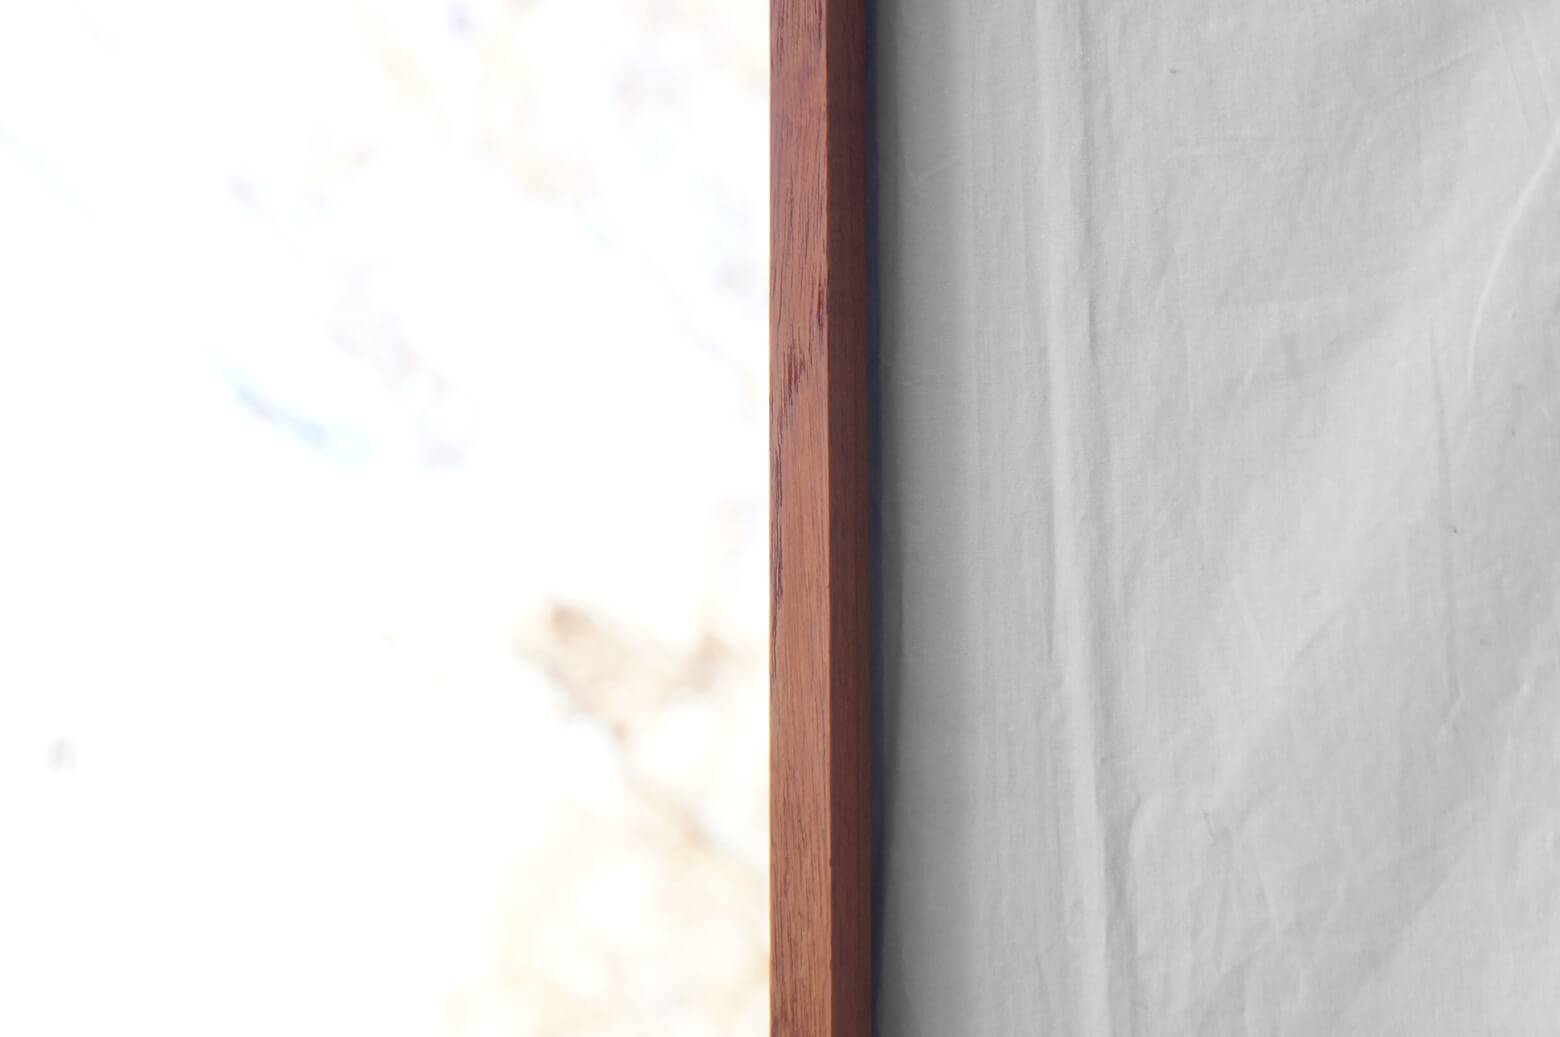 Finnish Vintage Kuvastin Spegel Wall Mirror/フィンランド ヴィンテージ ウォールミラー